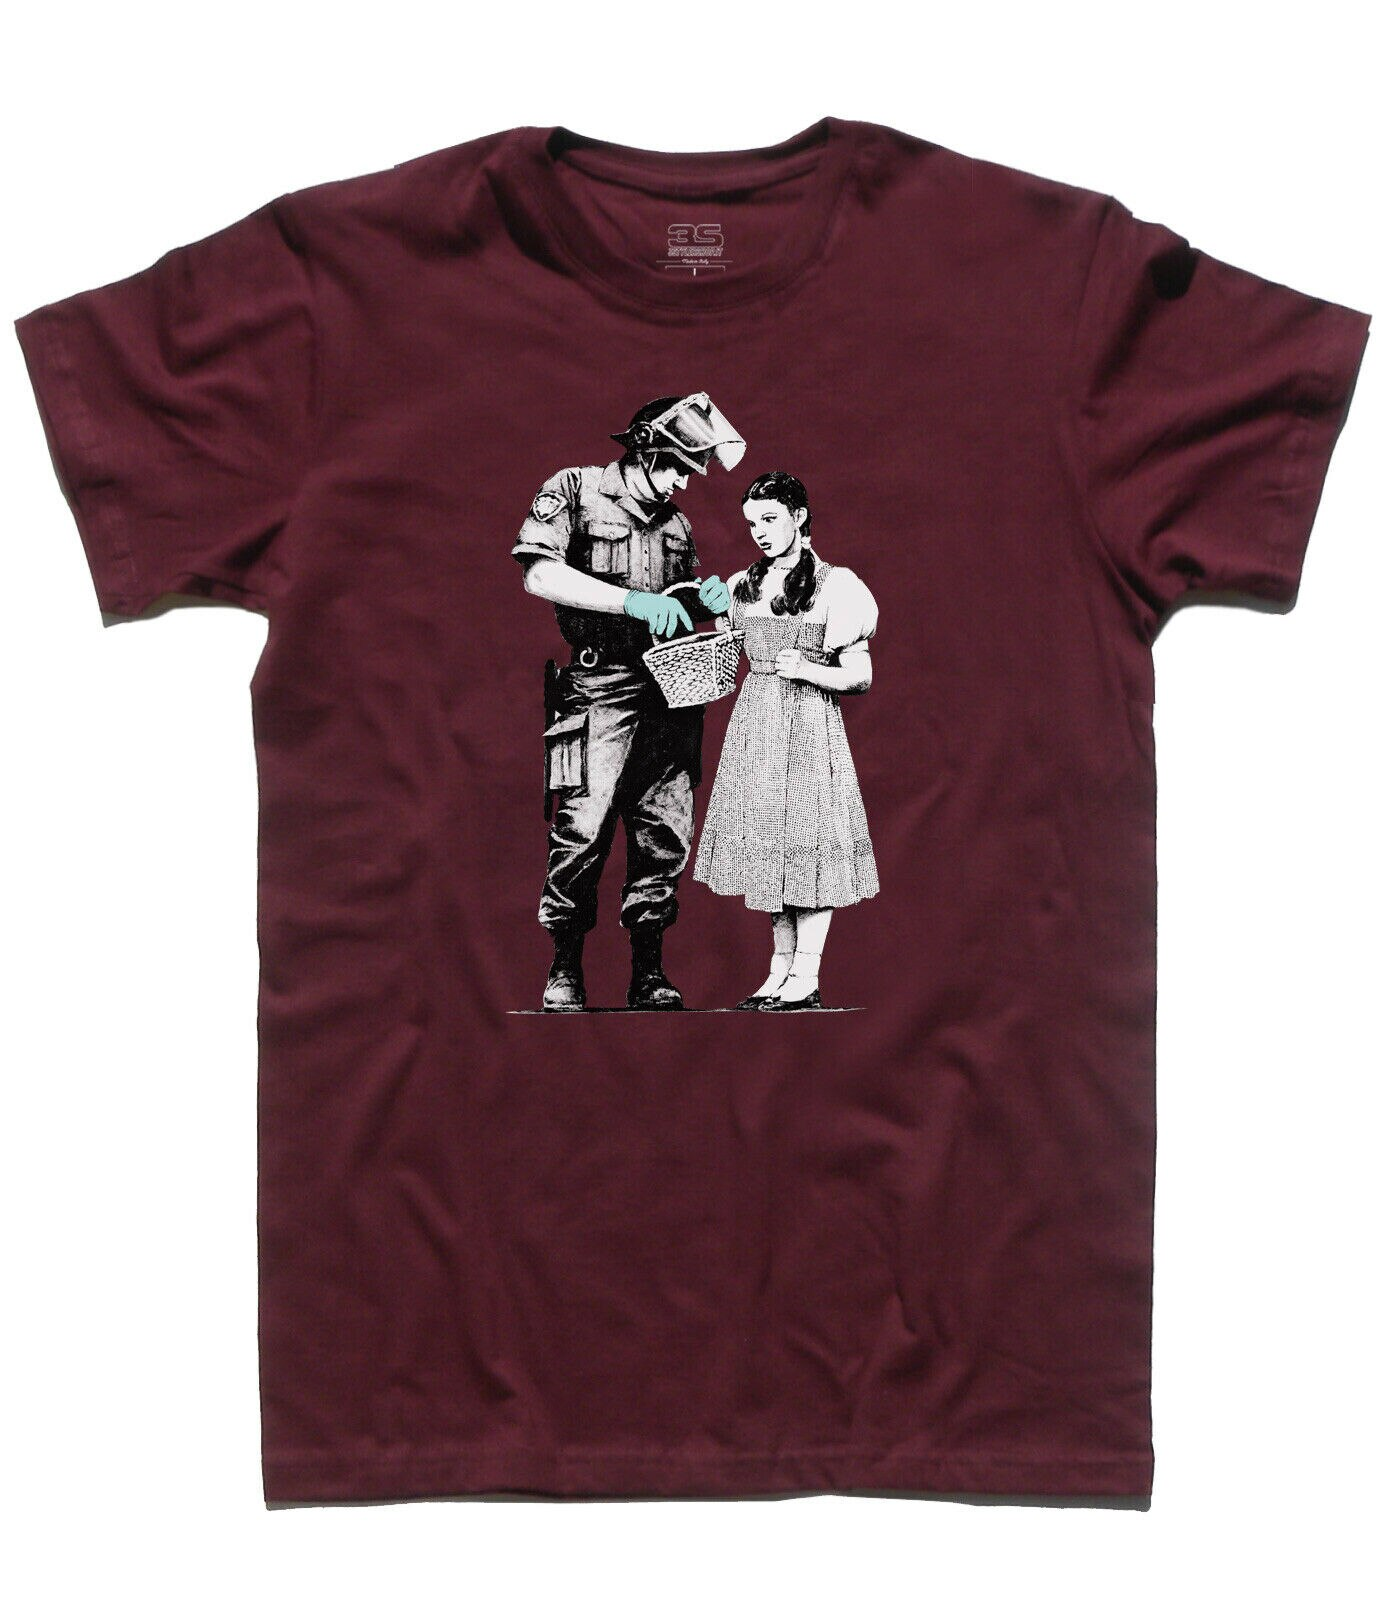 Camiseta banksy parar e procurar dorothy mago di oz poliziotto polícia rua